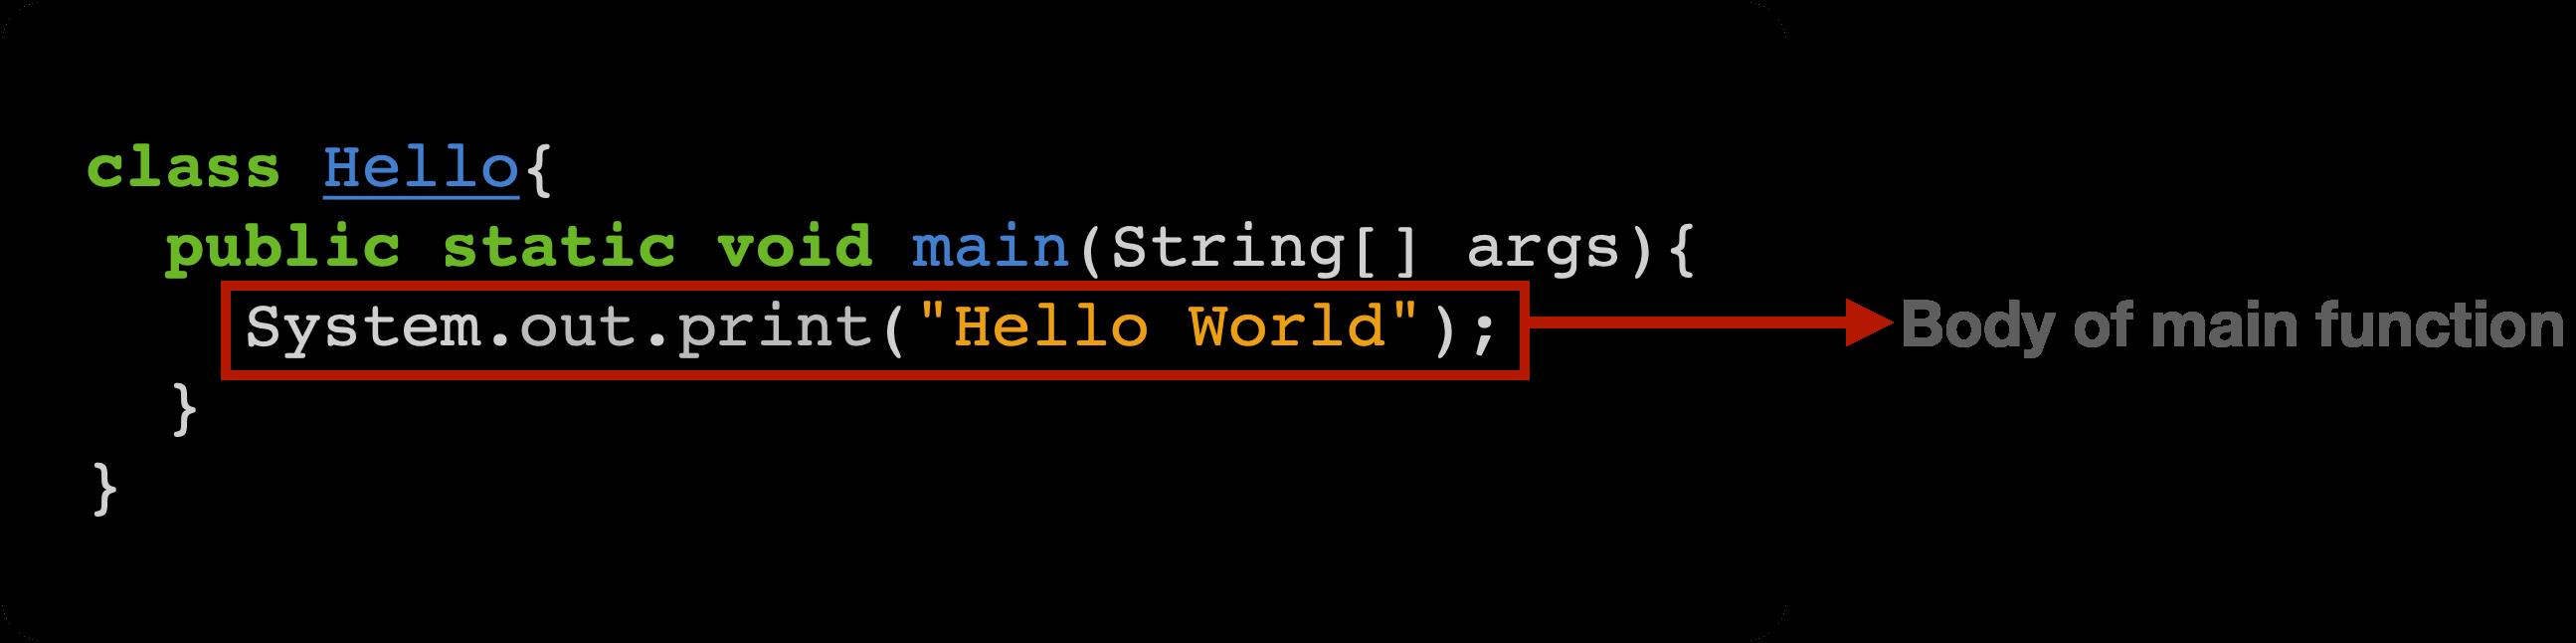 Java Hello World main method explanation